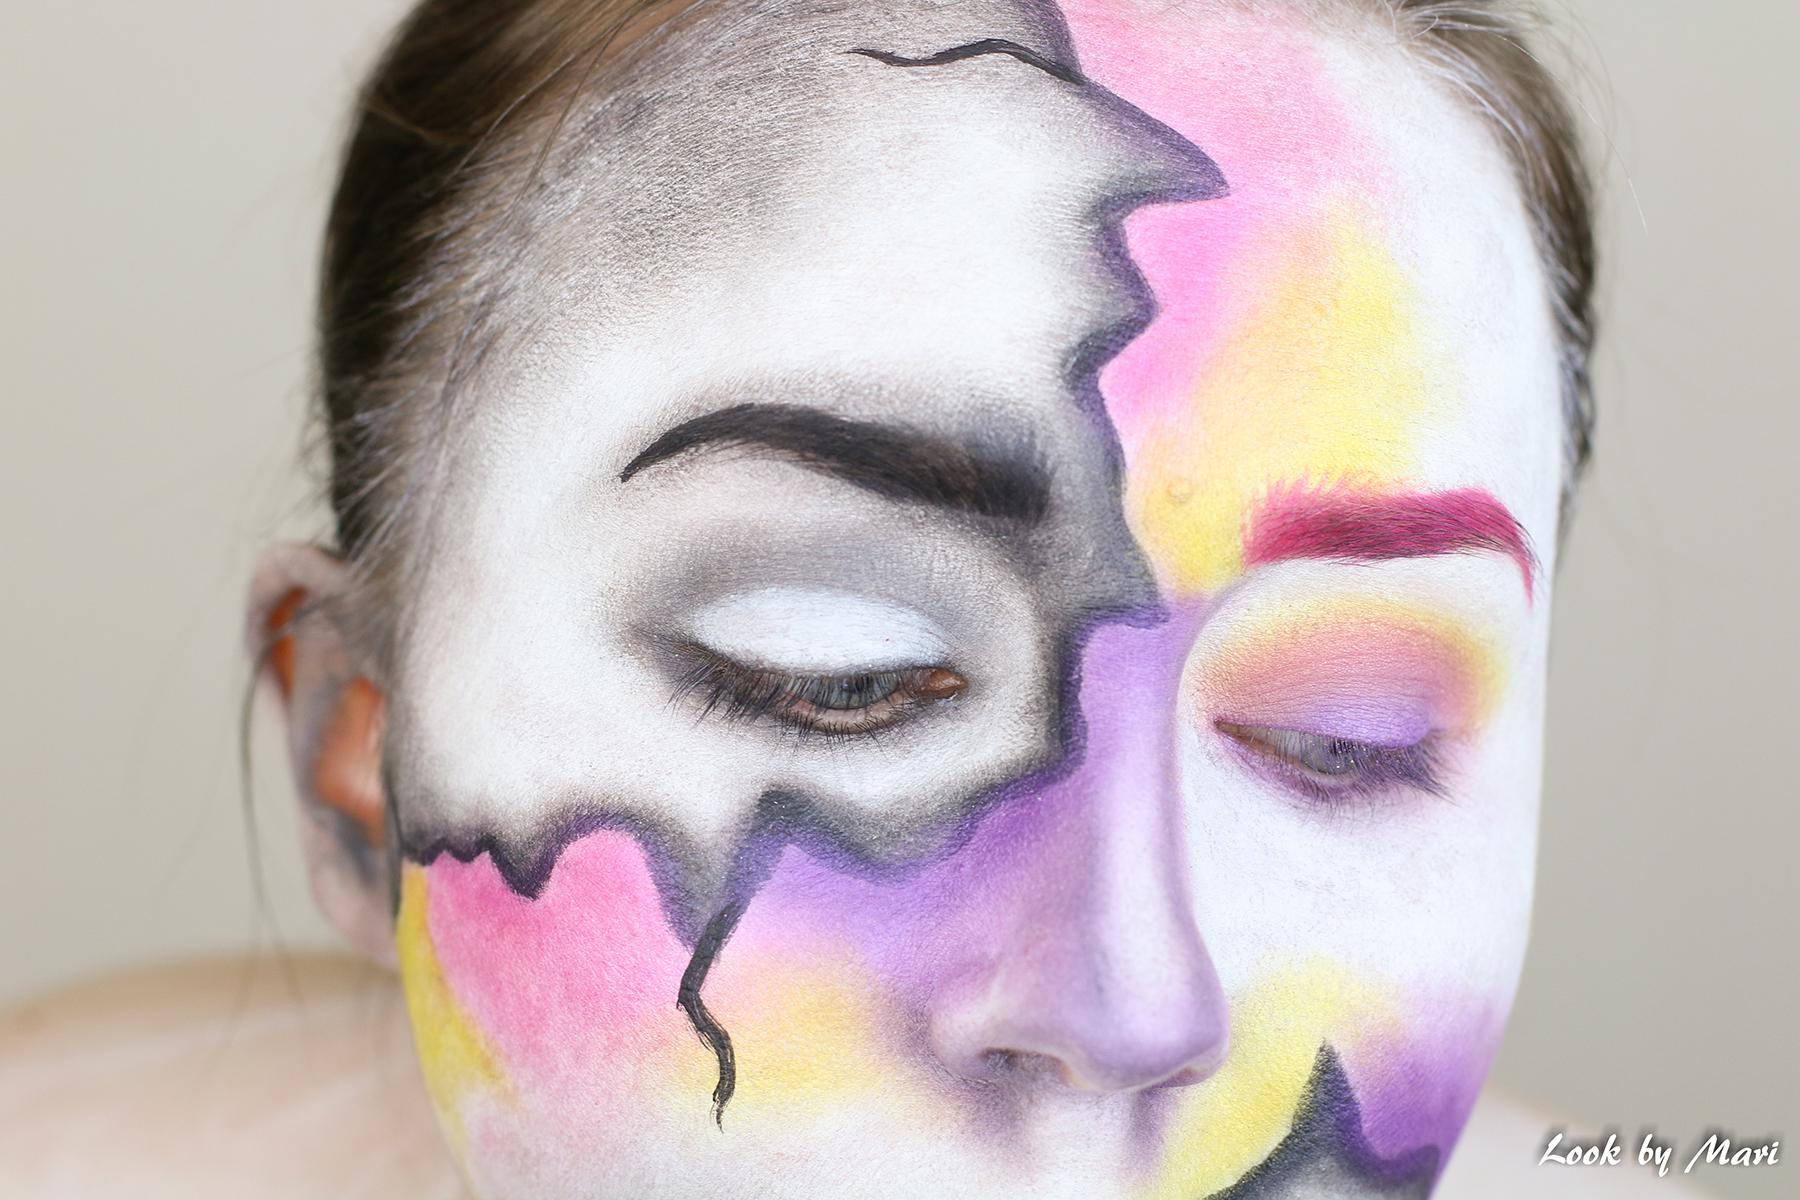 16 morphe brushes 35U beautybay review kokemuksia luotettava tullit alv